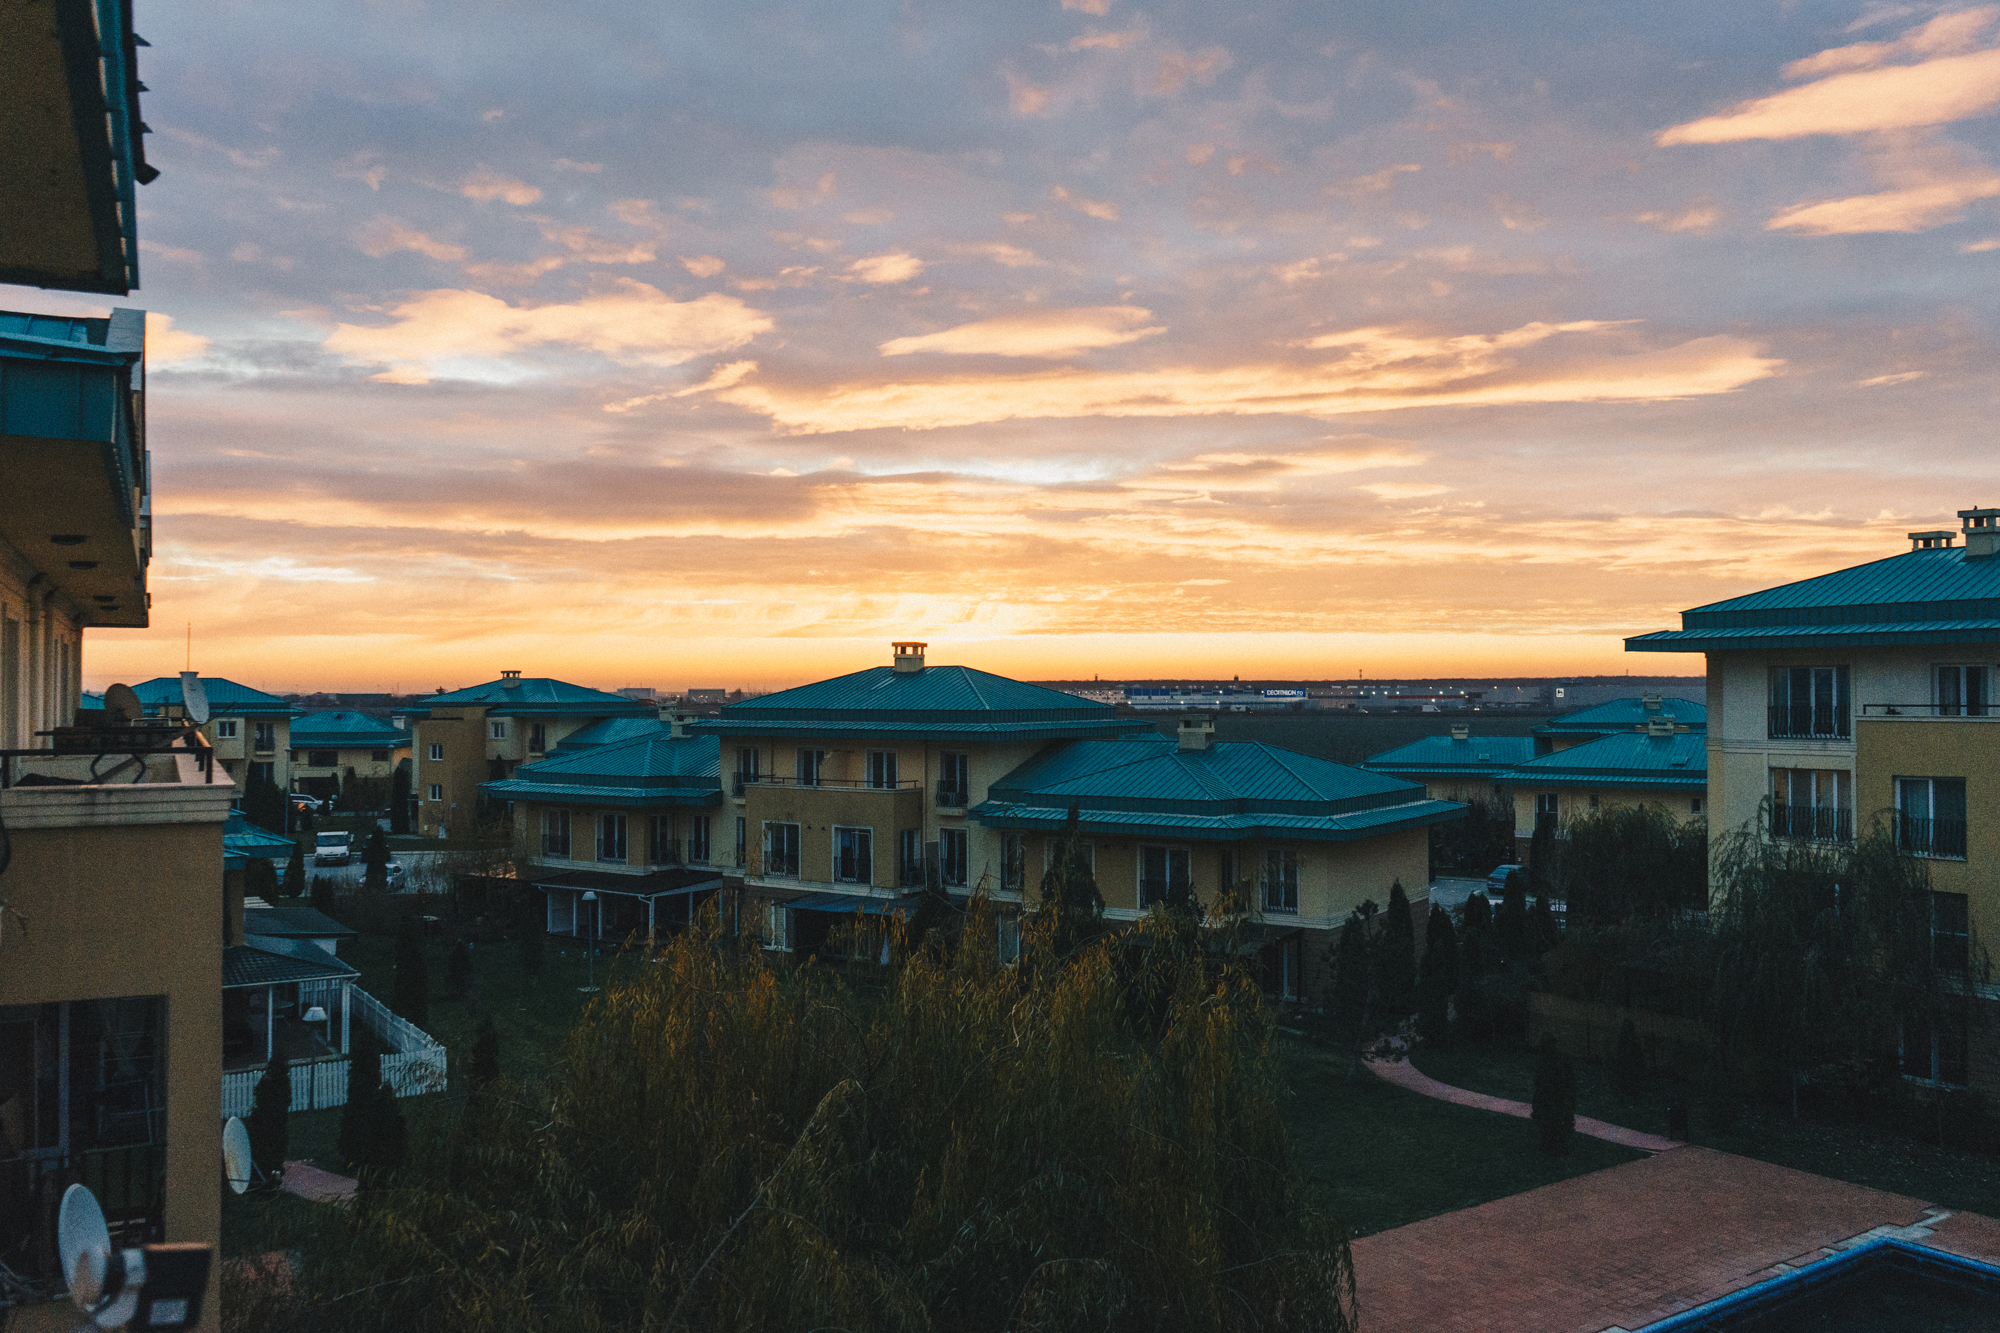 Sunset in Bucharest, Romania | thetravelsketch.com